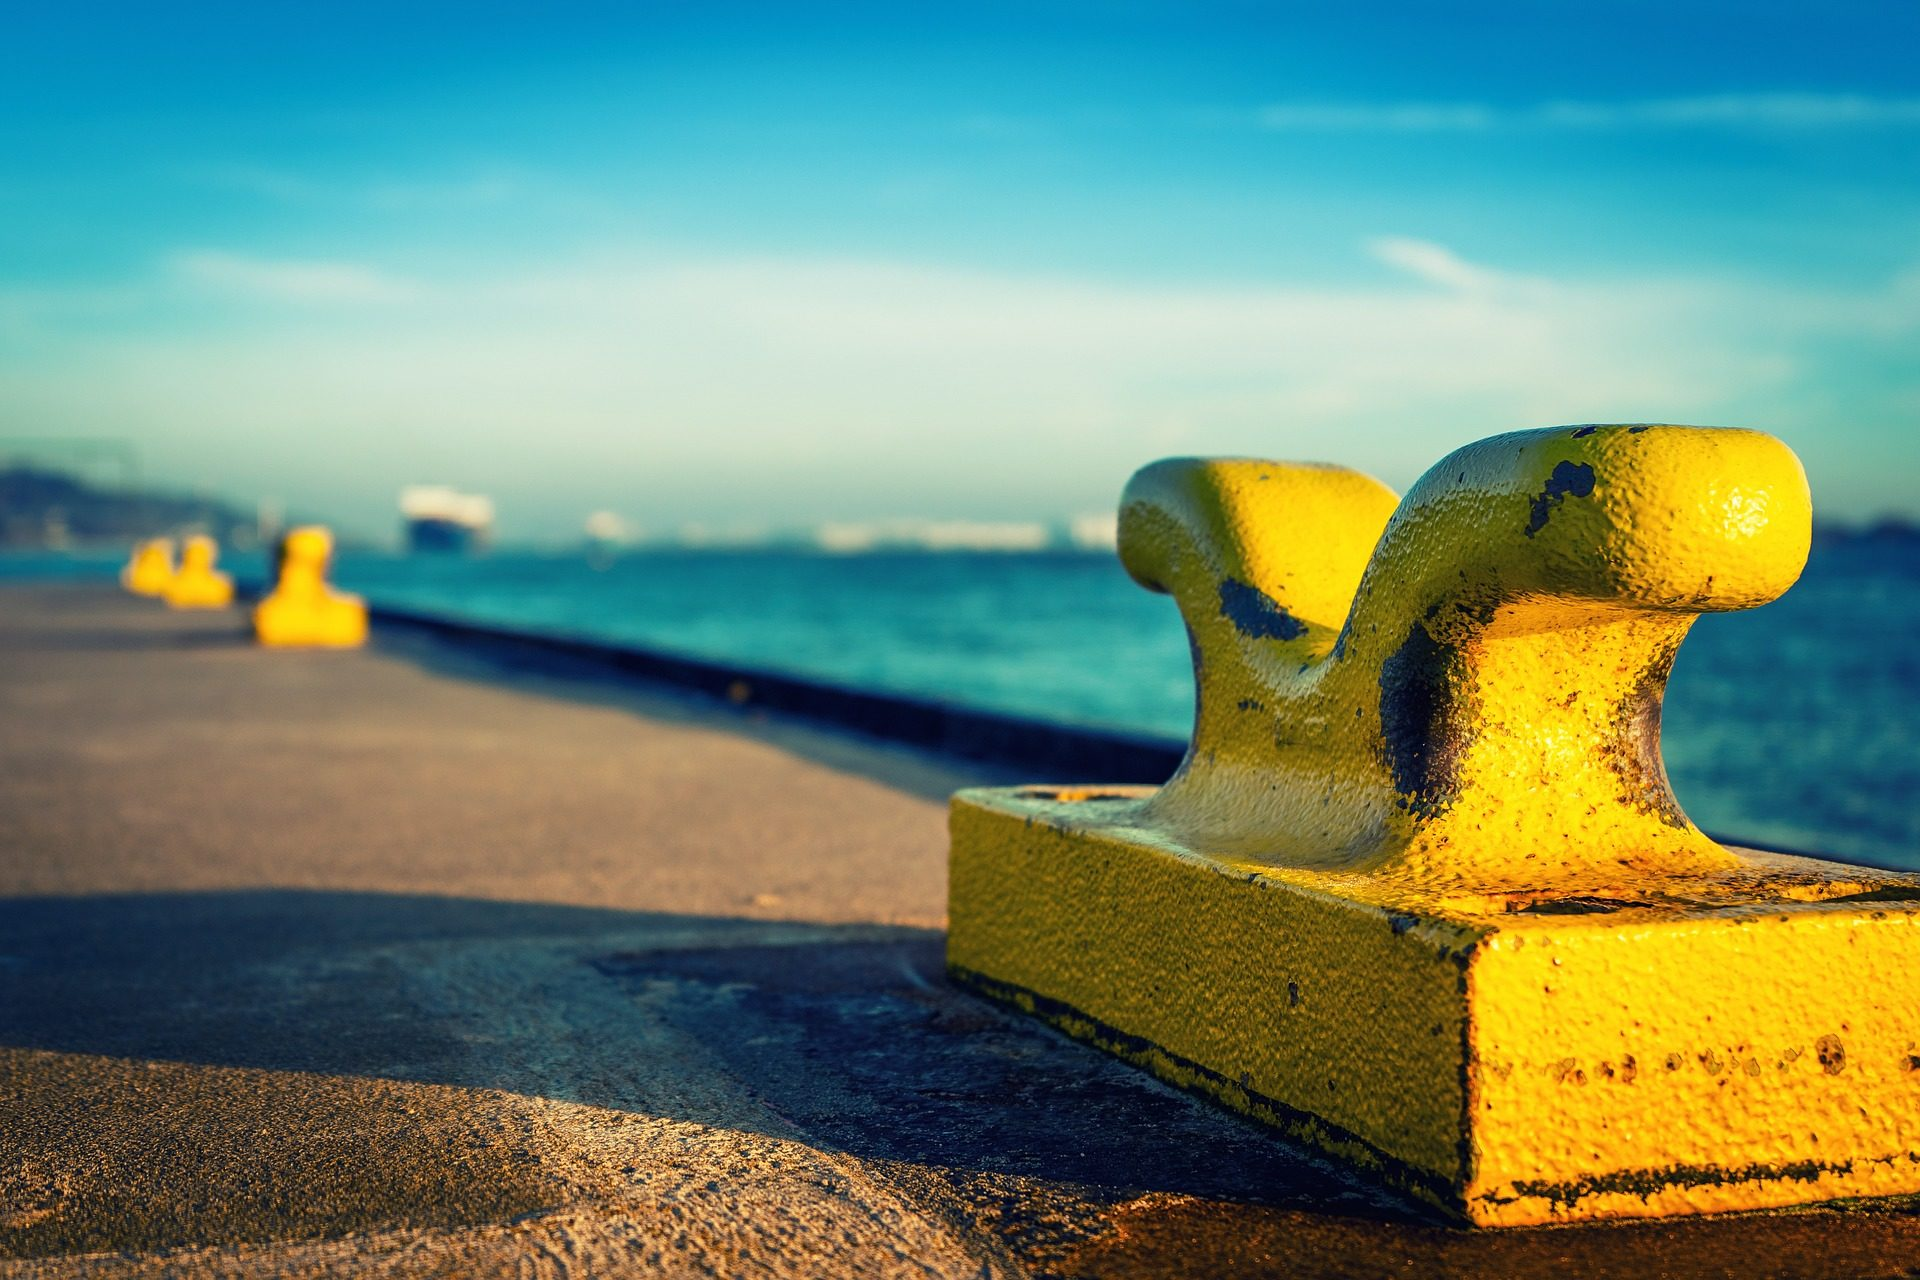 puerto, amarre, mar, elba, hamburgo - Fondos de Pantalla HD - professor-falken.com